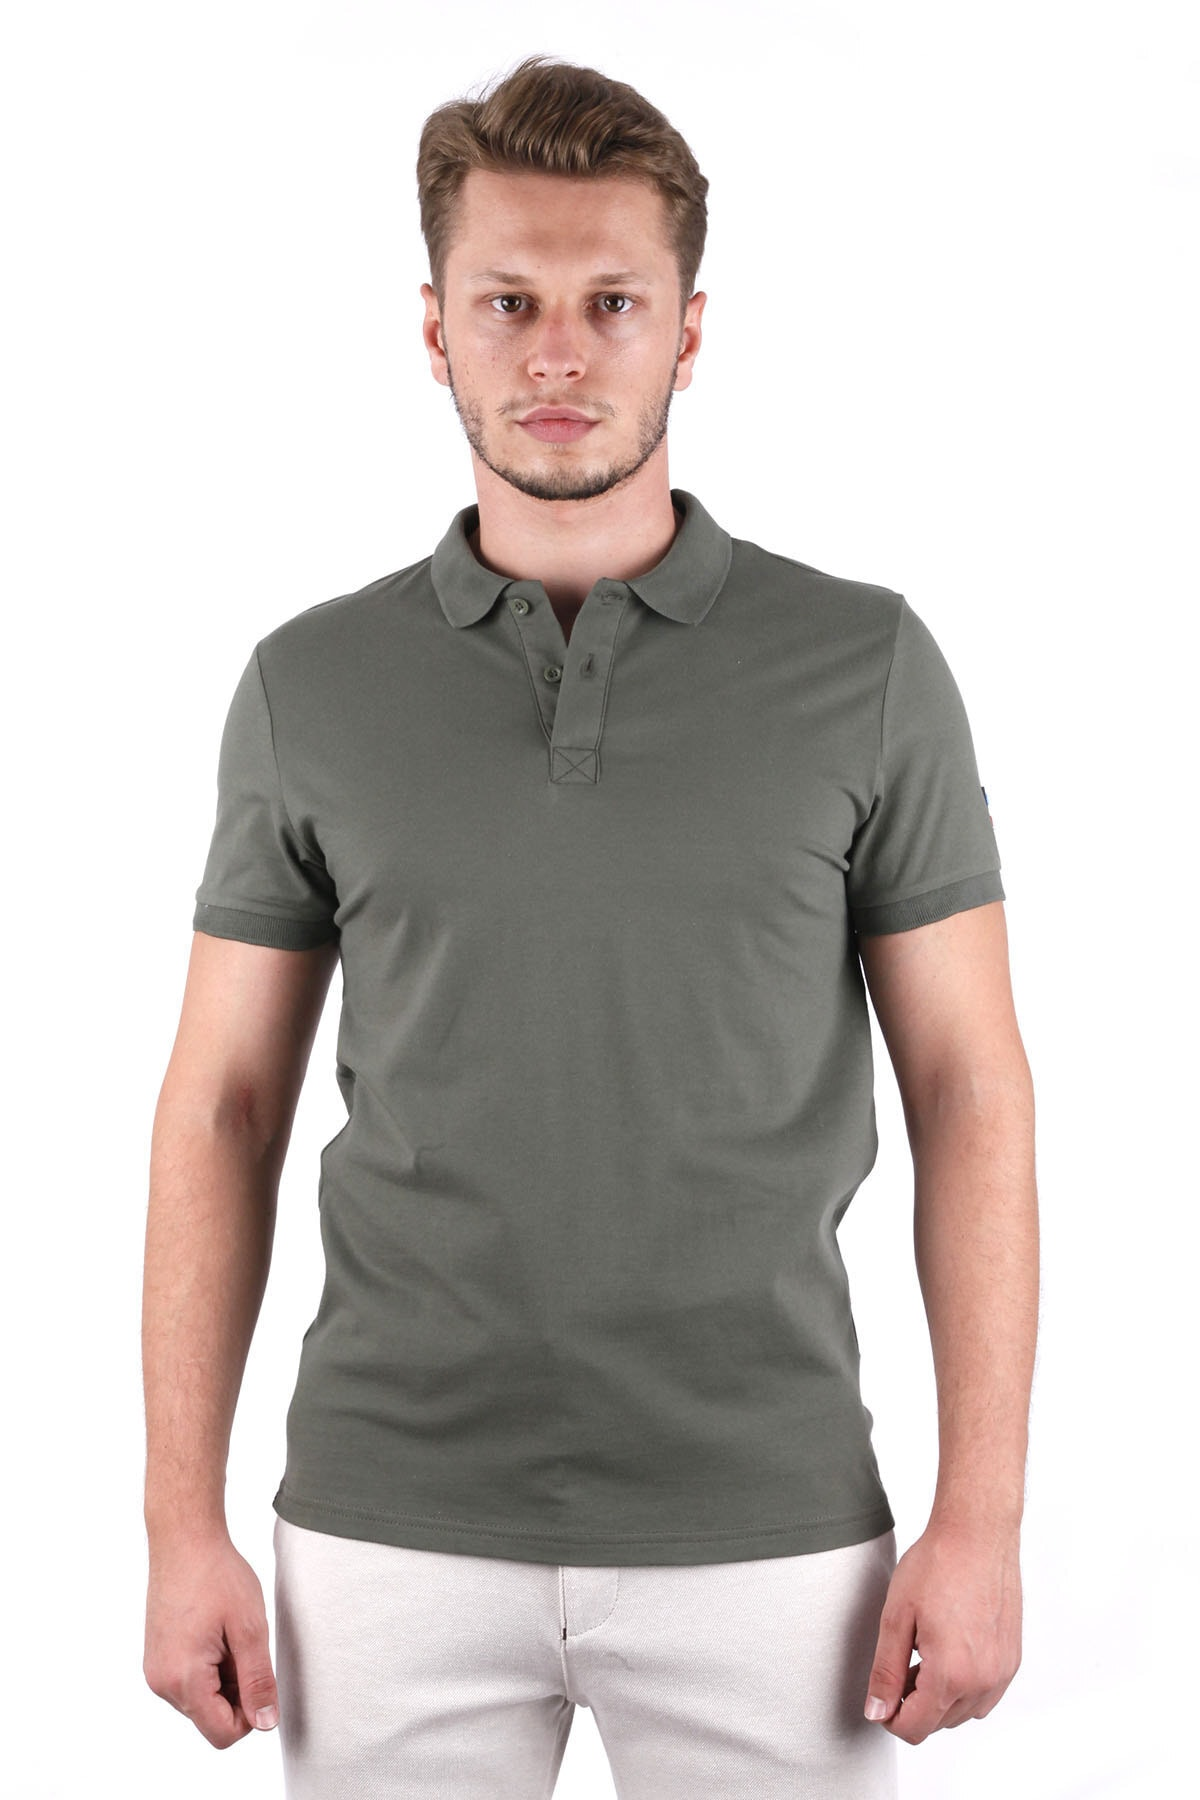 Canelia Erkek Haki Likralı Pike Slimfit Polo Yaka T-shirt 1